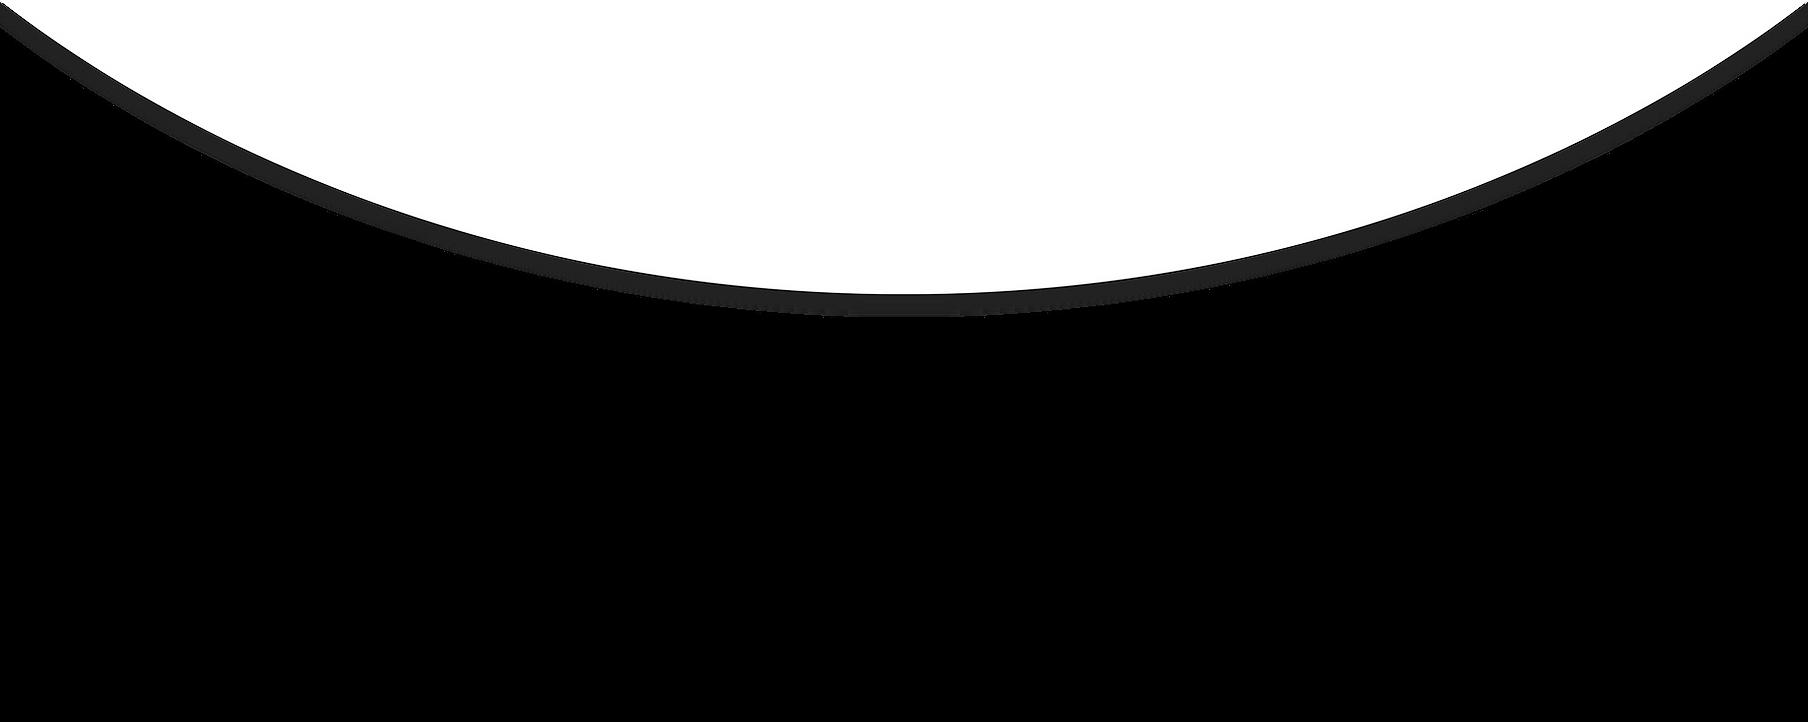 curve-02-02.png